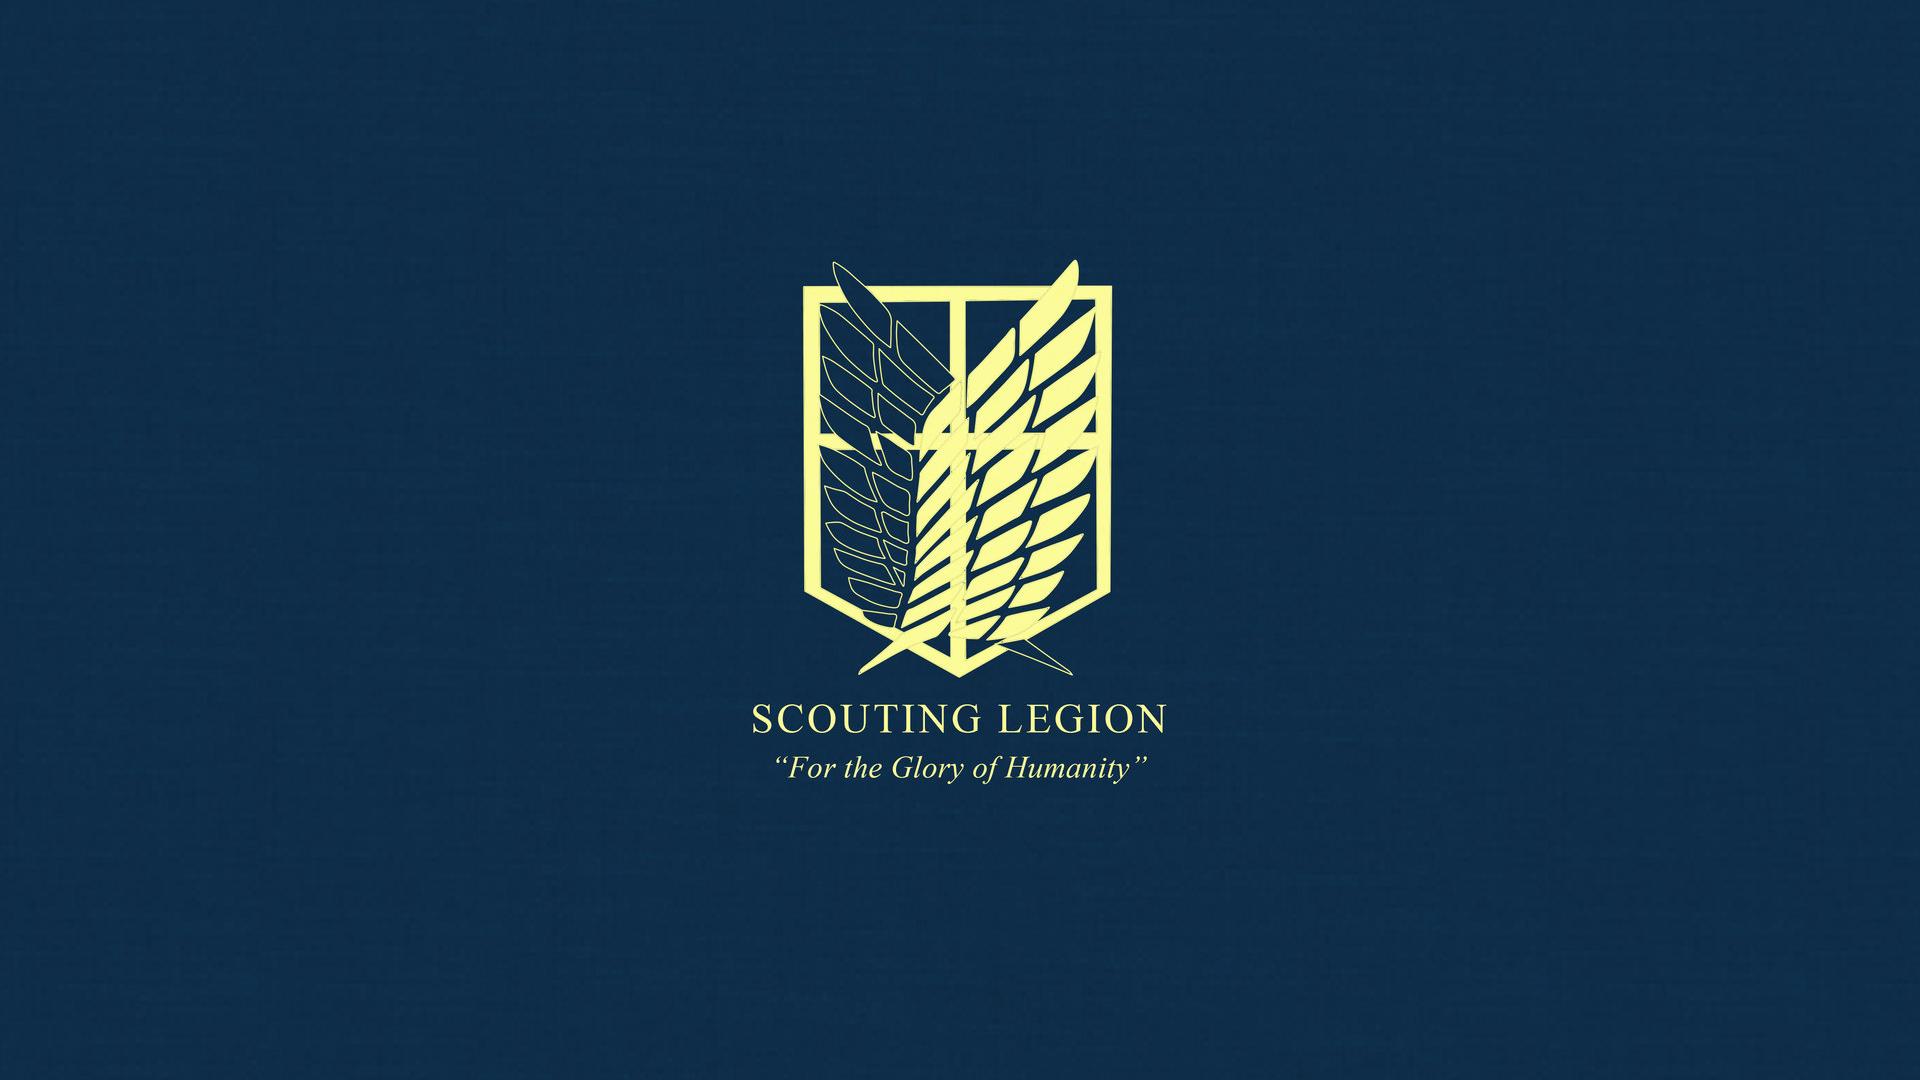 Attack On Titan Scouting Legion Wallpaper By Imxset21